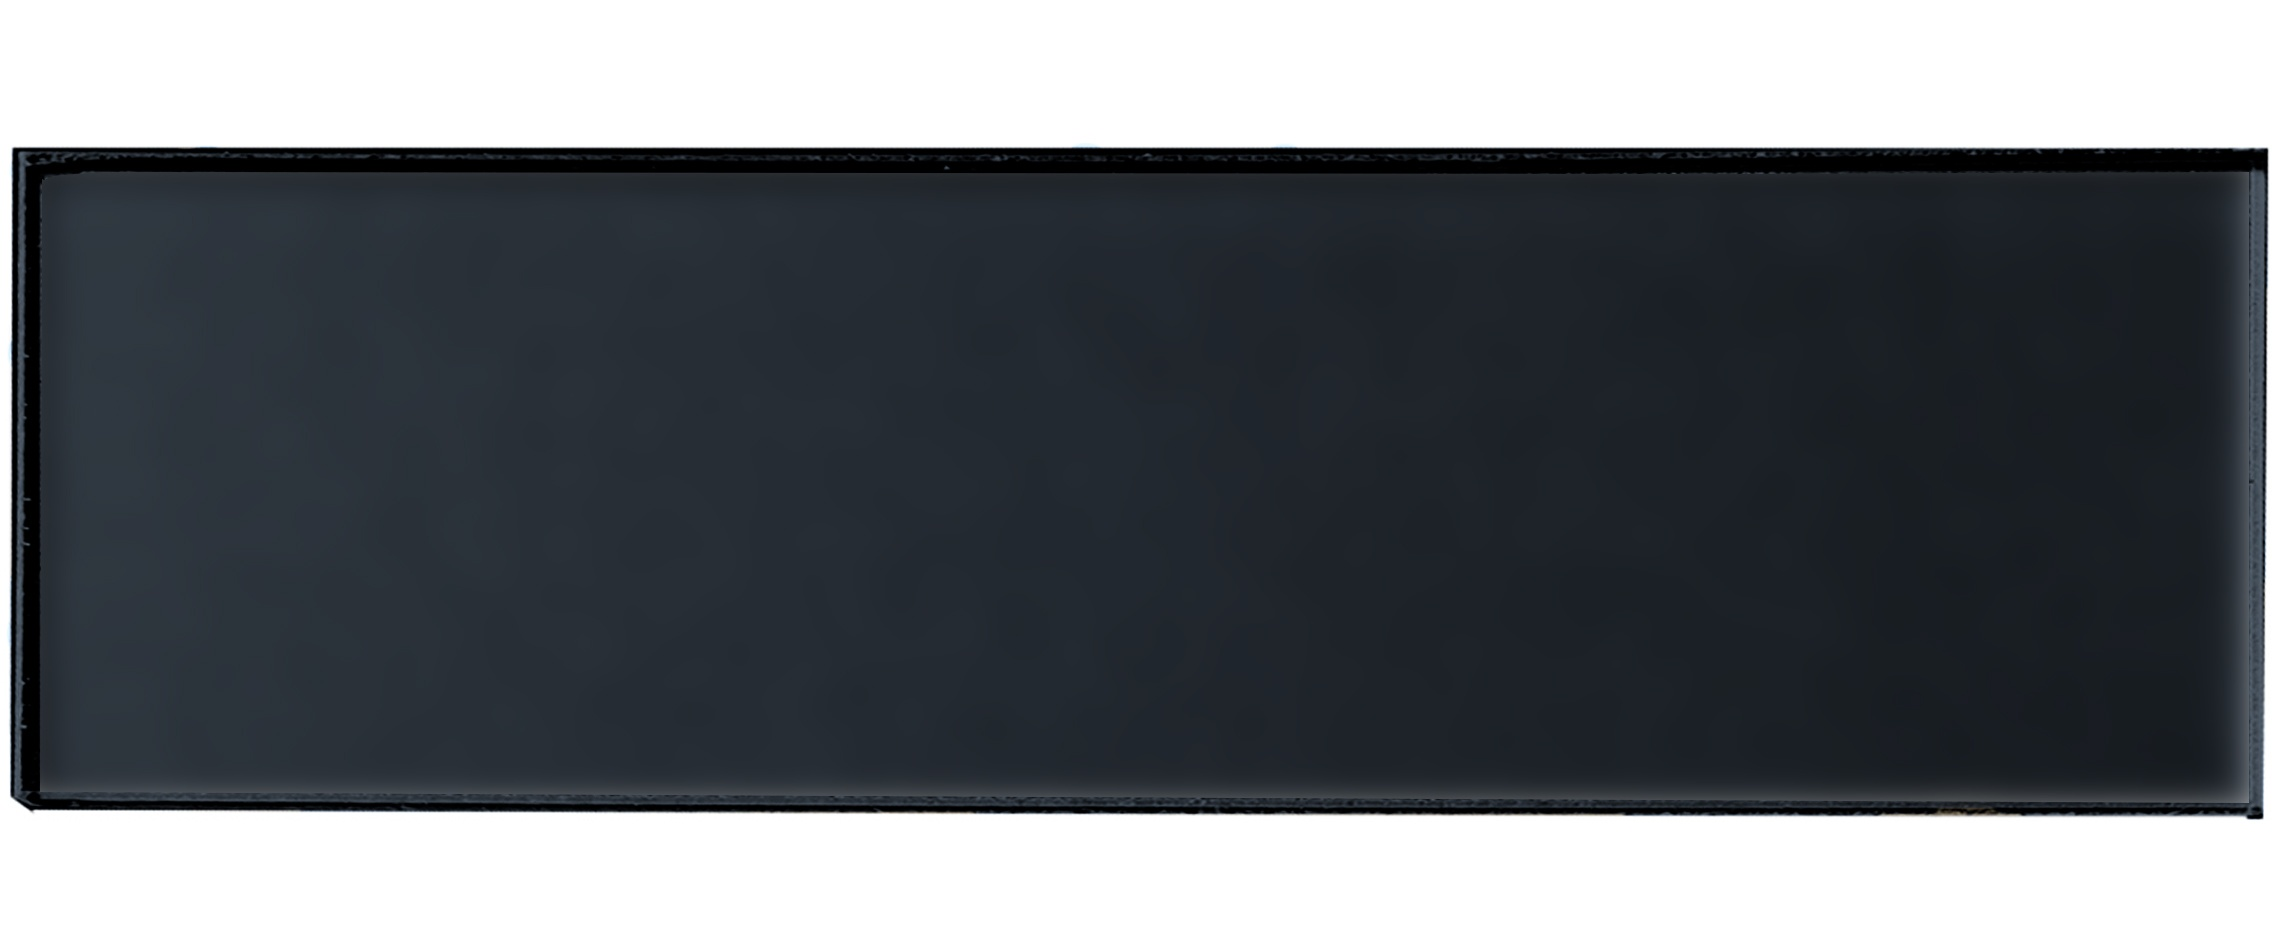 "Forever 4"" x 16"" Matte Black Glass Subway Backsplash Wall Tile"